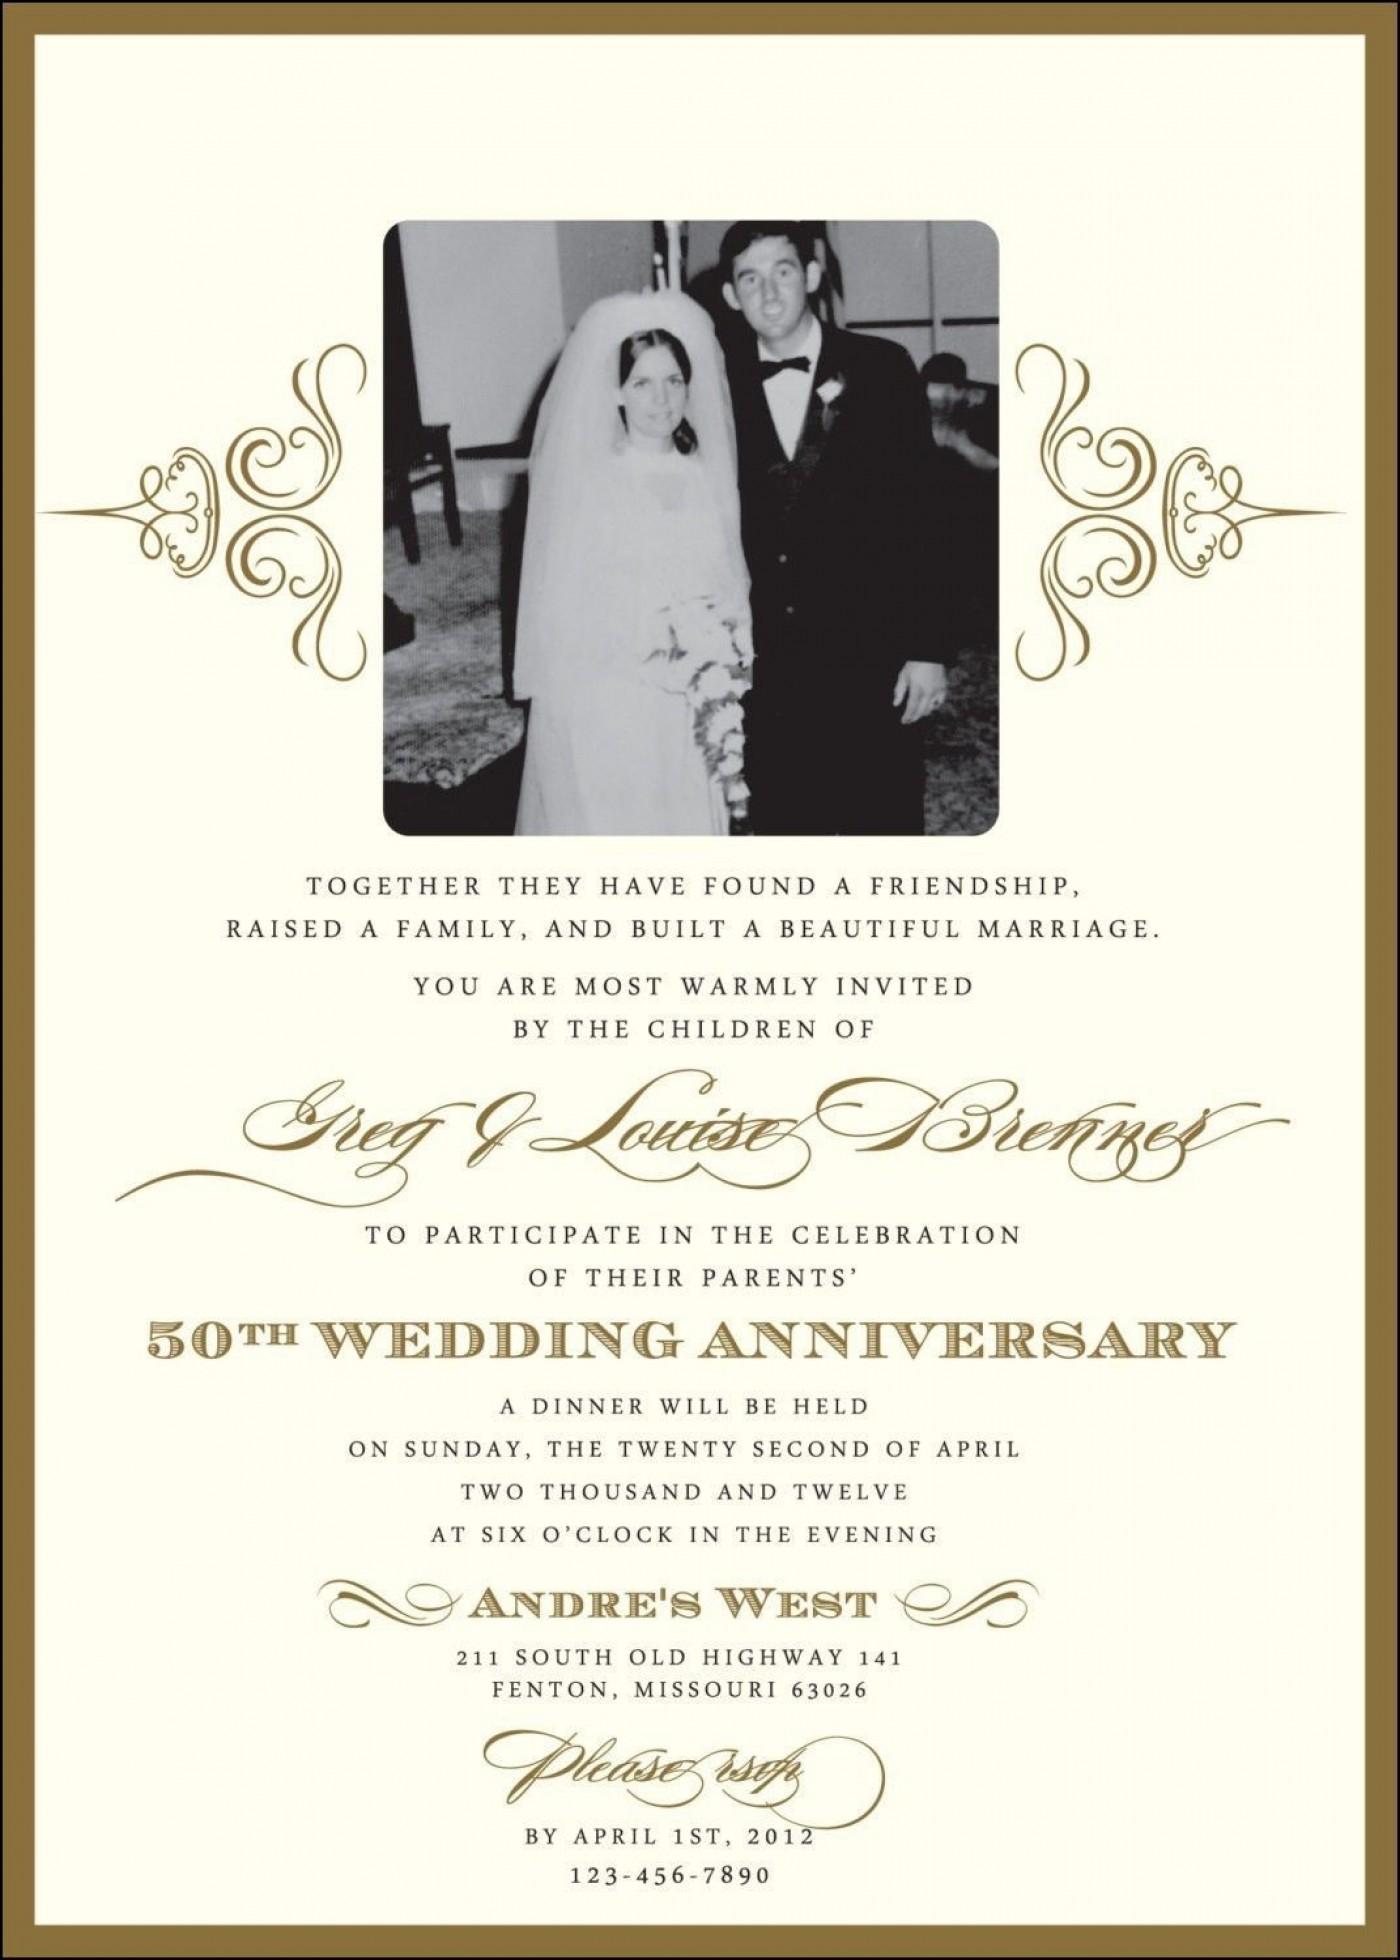 004 Dreaded 50th Anniversary Invitation Wording Sample High Definition  Wedding 60th In Tamil Birthday1400